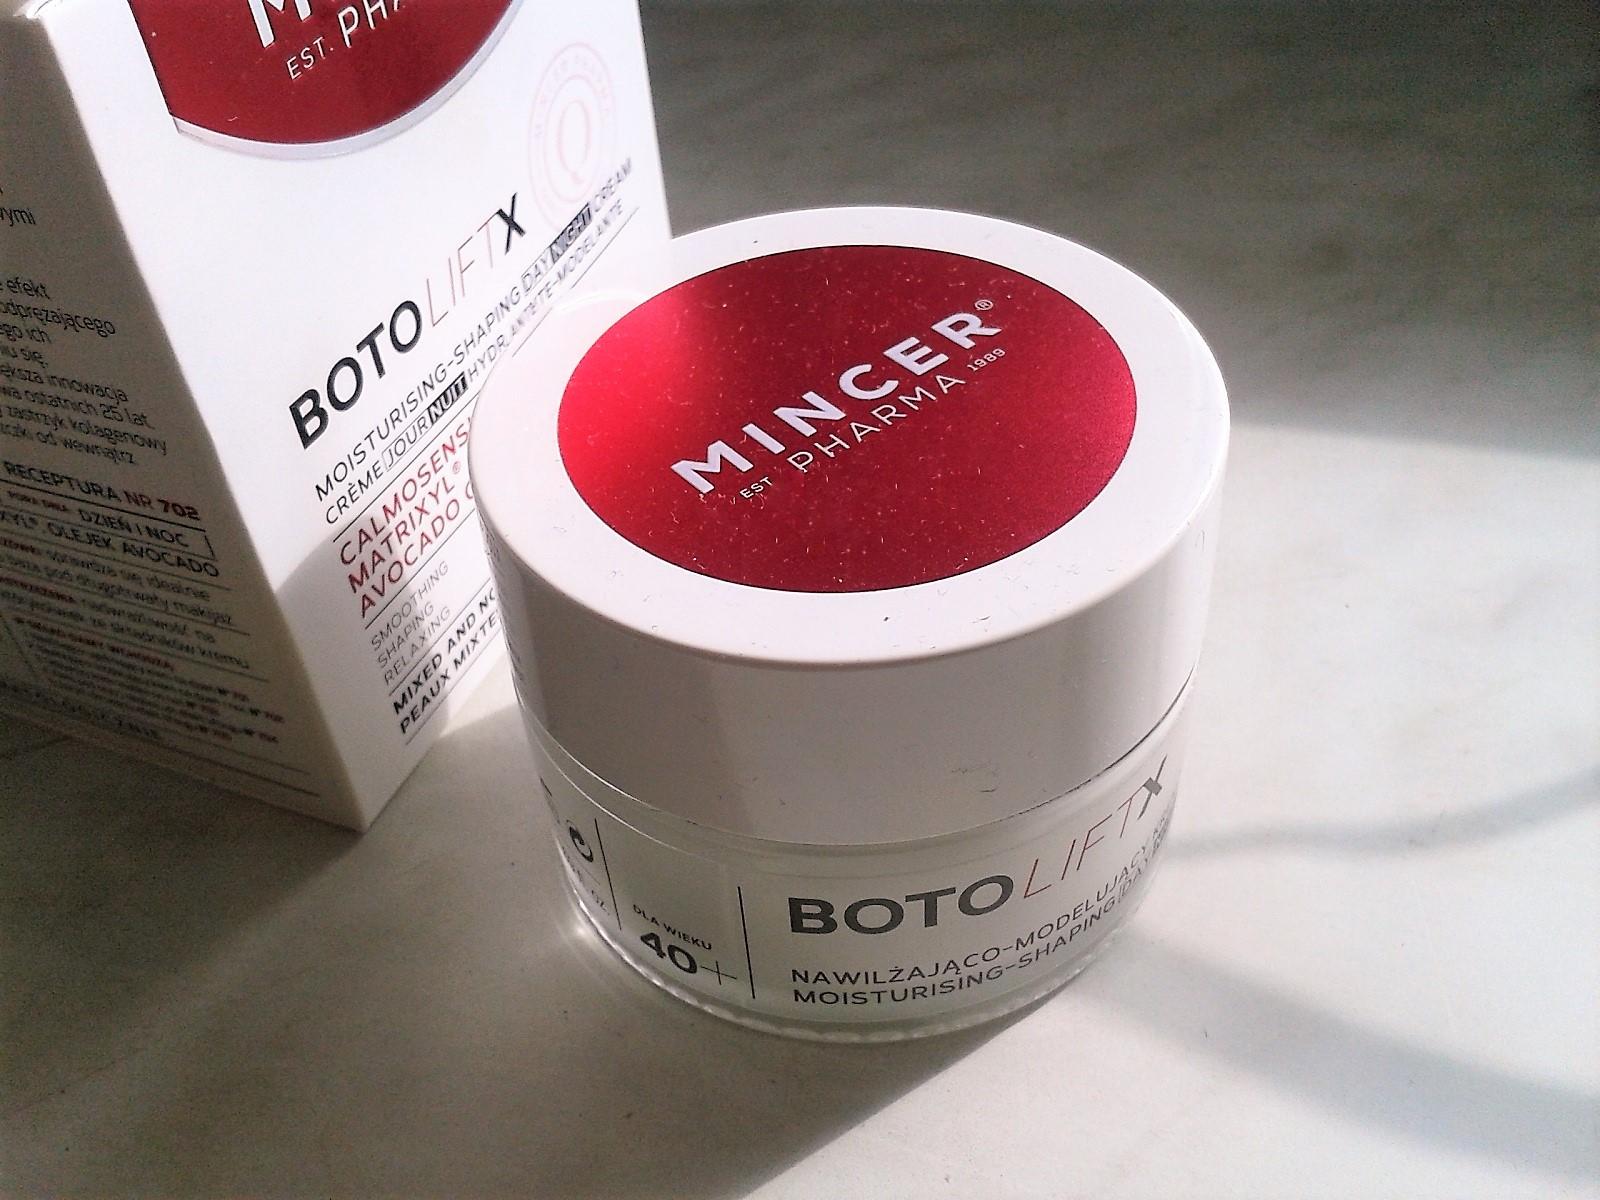 Mincer Botoliftx